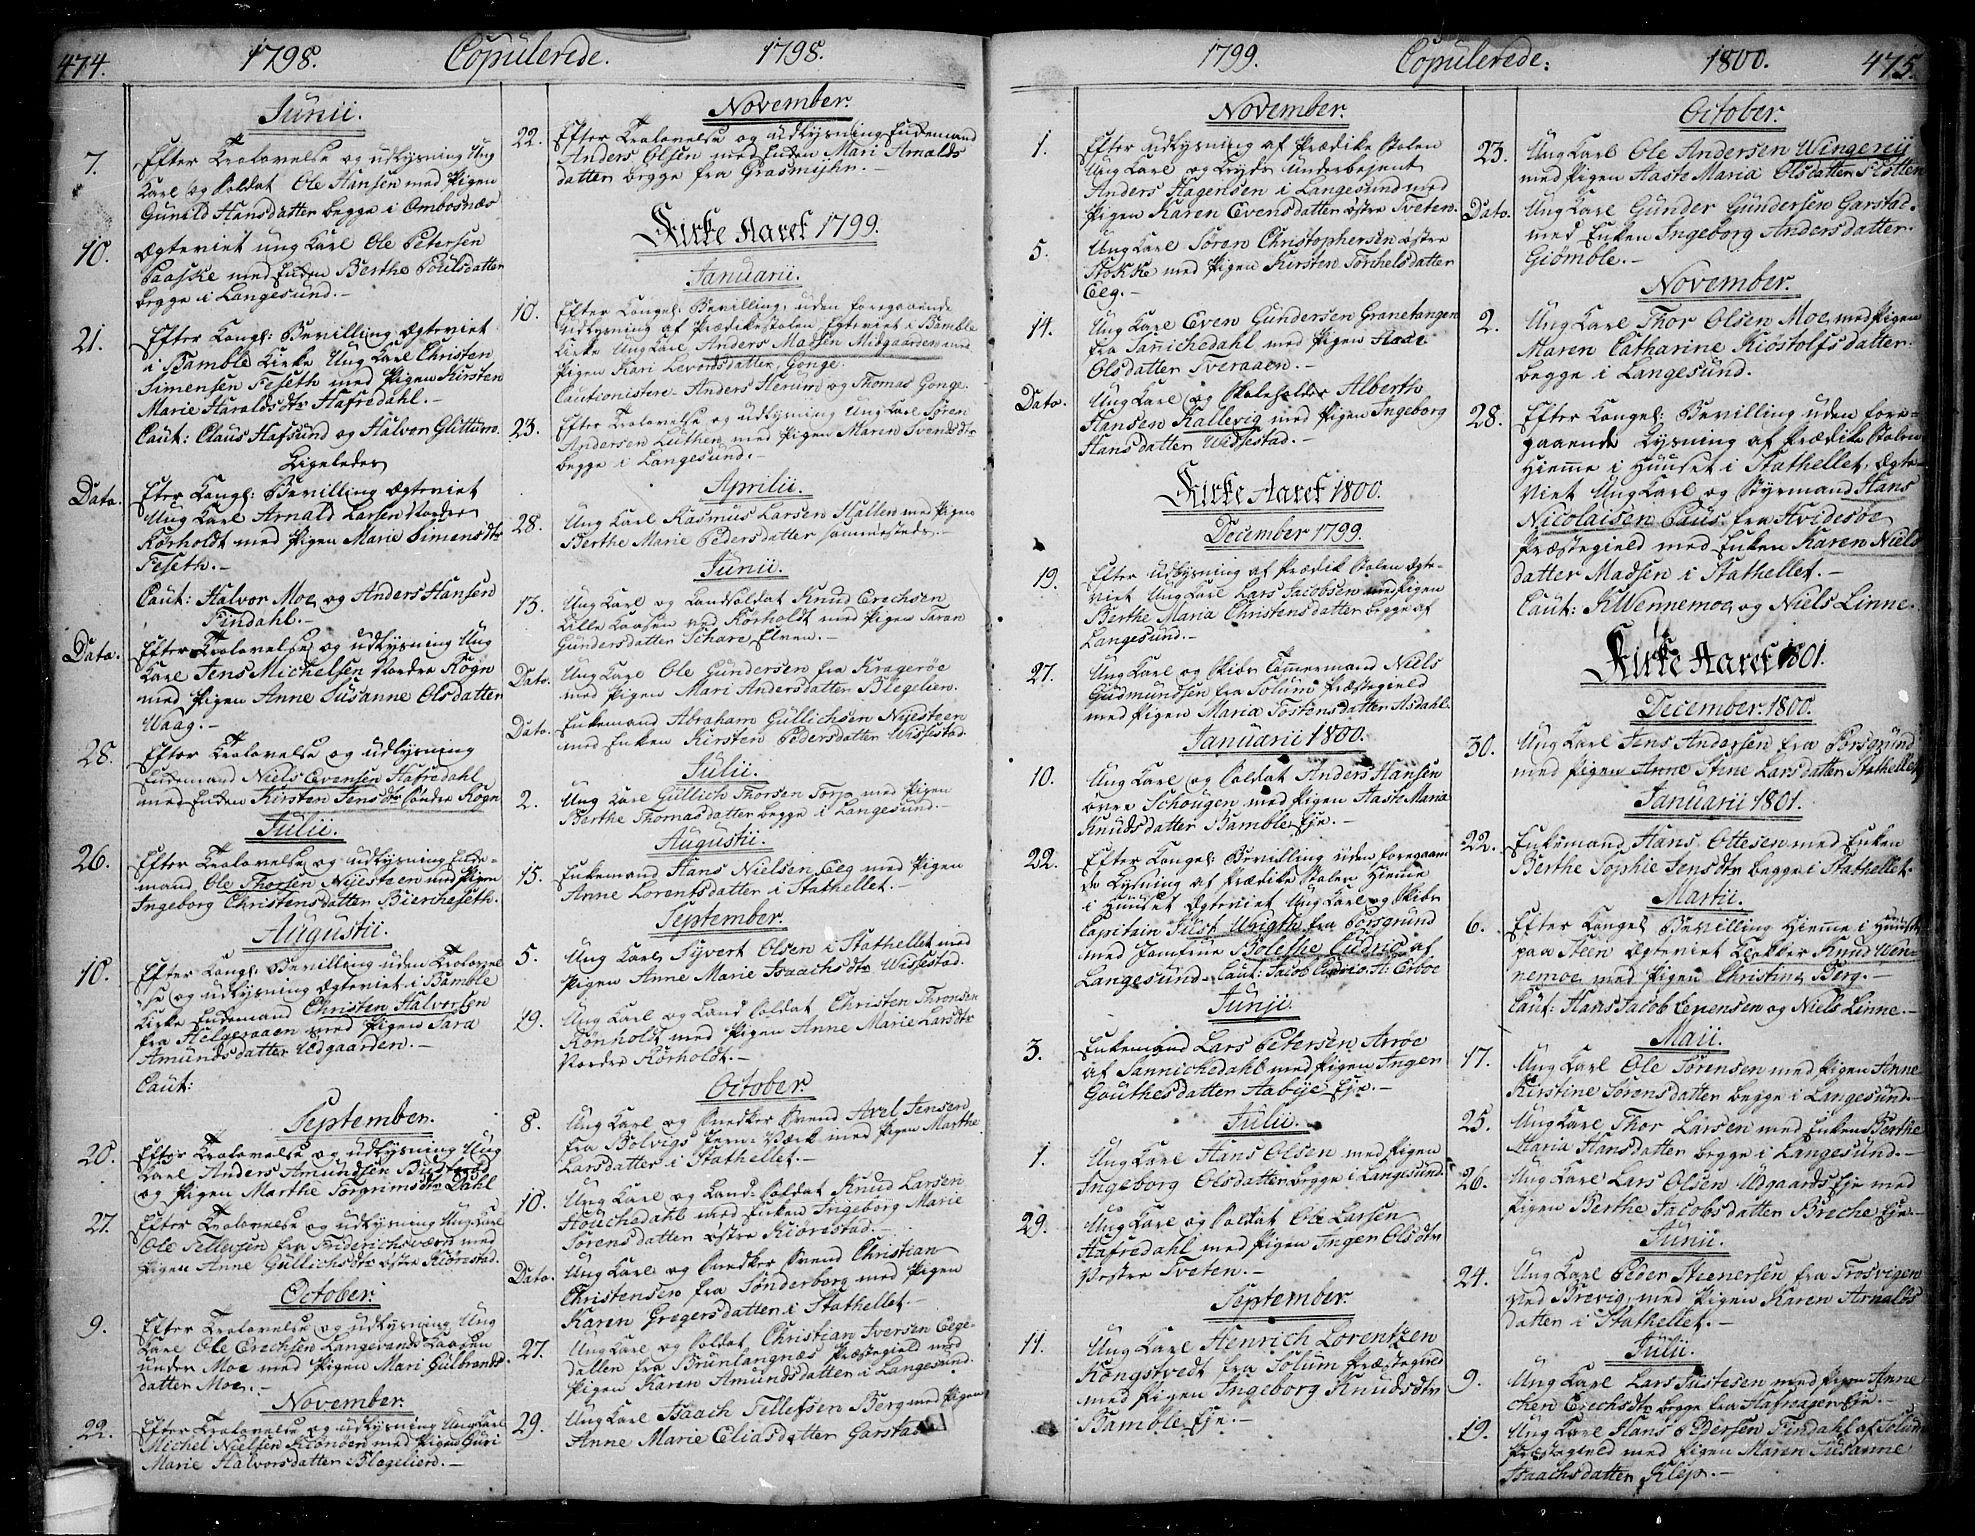 SAKO, Bamble kirkebøker, F/Fa/L0002: Ministerialbok nr. I 2, 1775-1814, s. 474-475